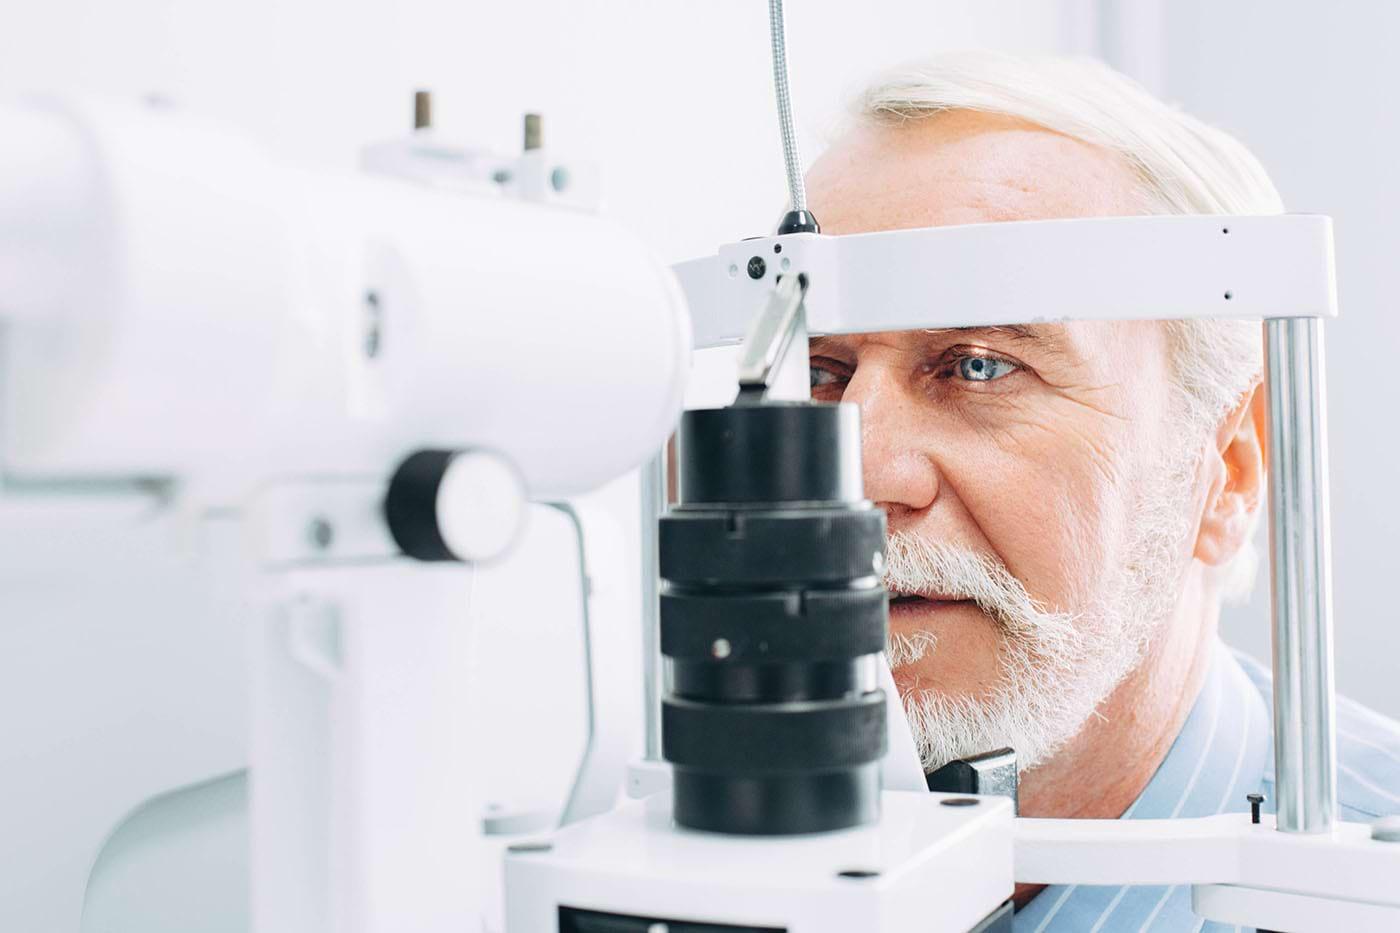 Tratament nou pentru pacienții cu retinopatie diabetică [studiu]